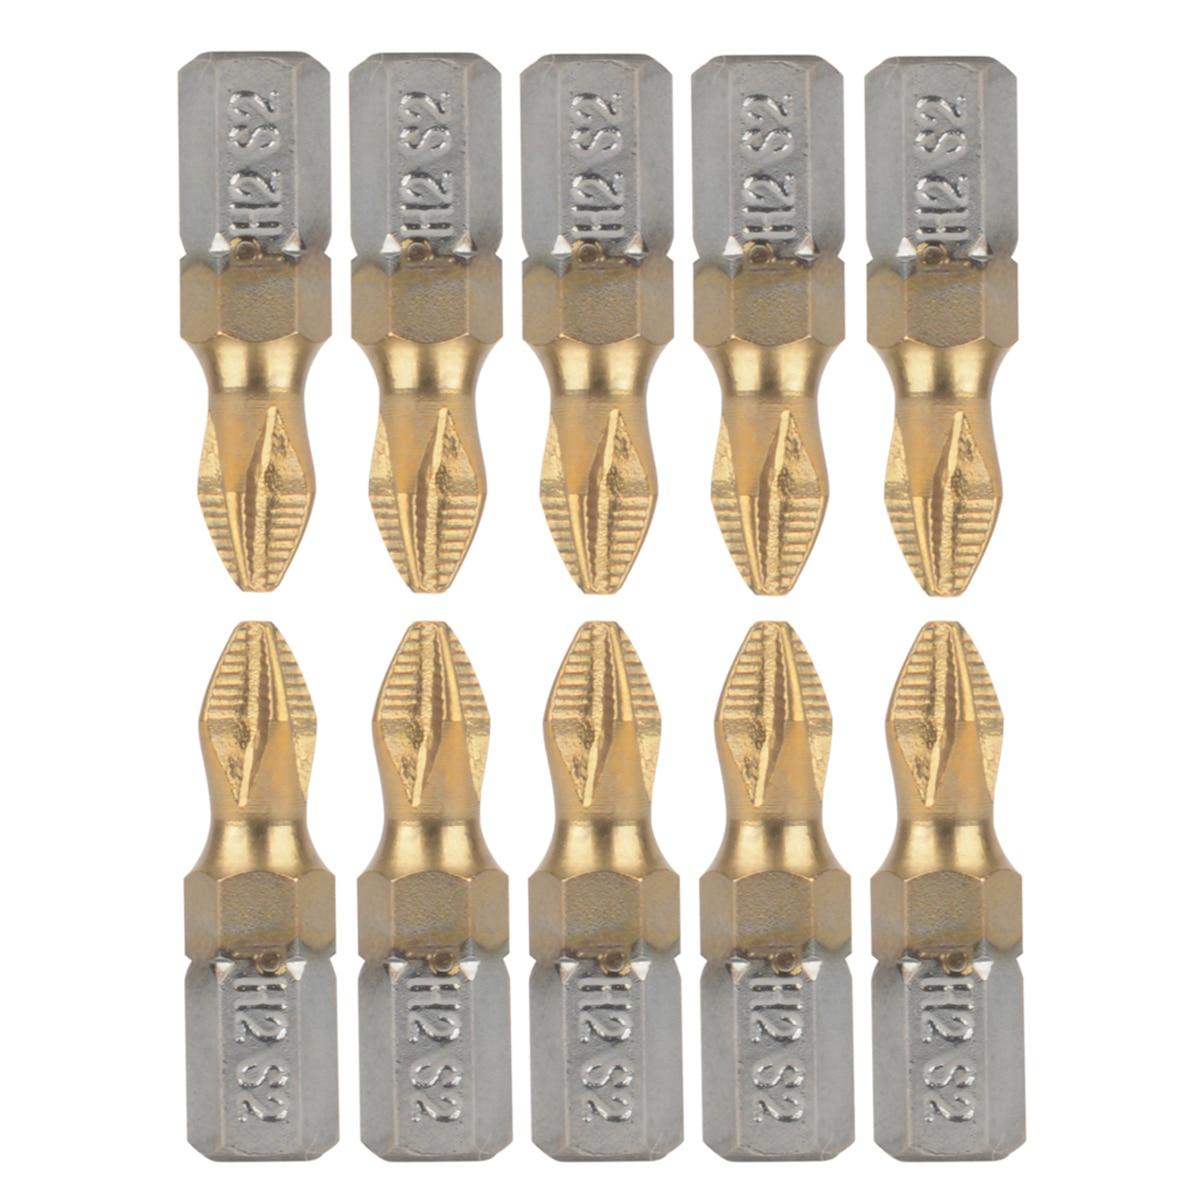 10pcs 25mm 1/4inch PH2 Magnetic Screwdriver Bits Shank Titanium Coated Screwdriver Bits Electric Drill Bits Power Tools 10pcs ph2 2a 3a 5aplasterboard positioning drill gypsum board phillips screwdriver bits 25mm